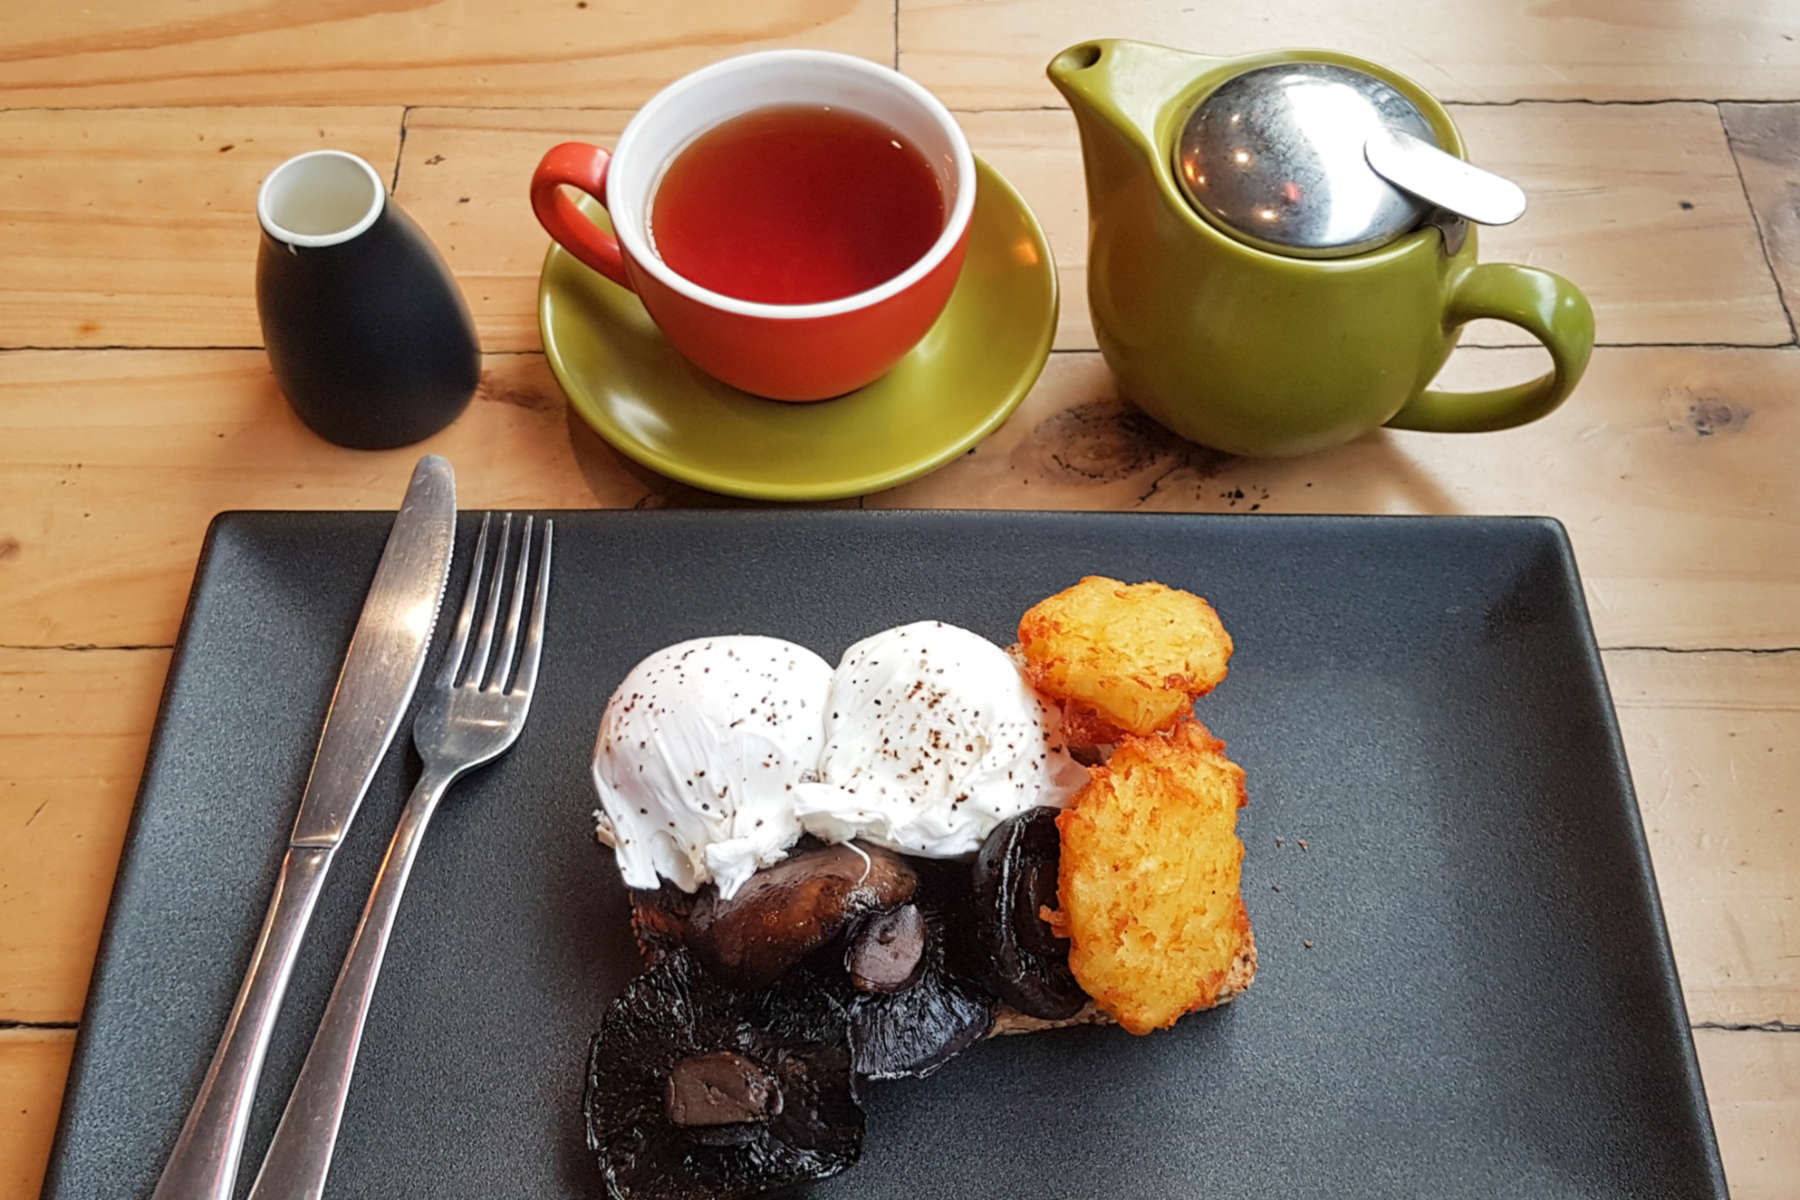 Arborist cooked breakfast and tea